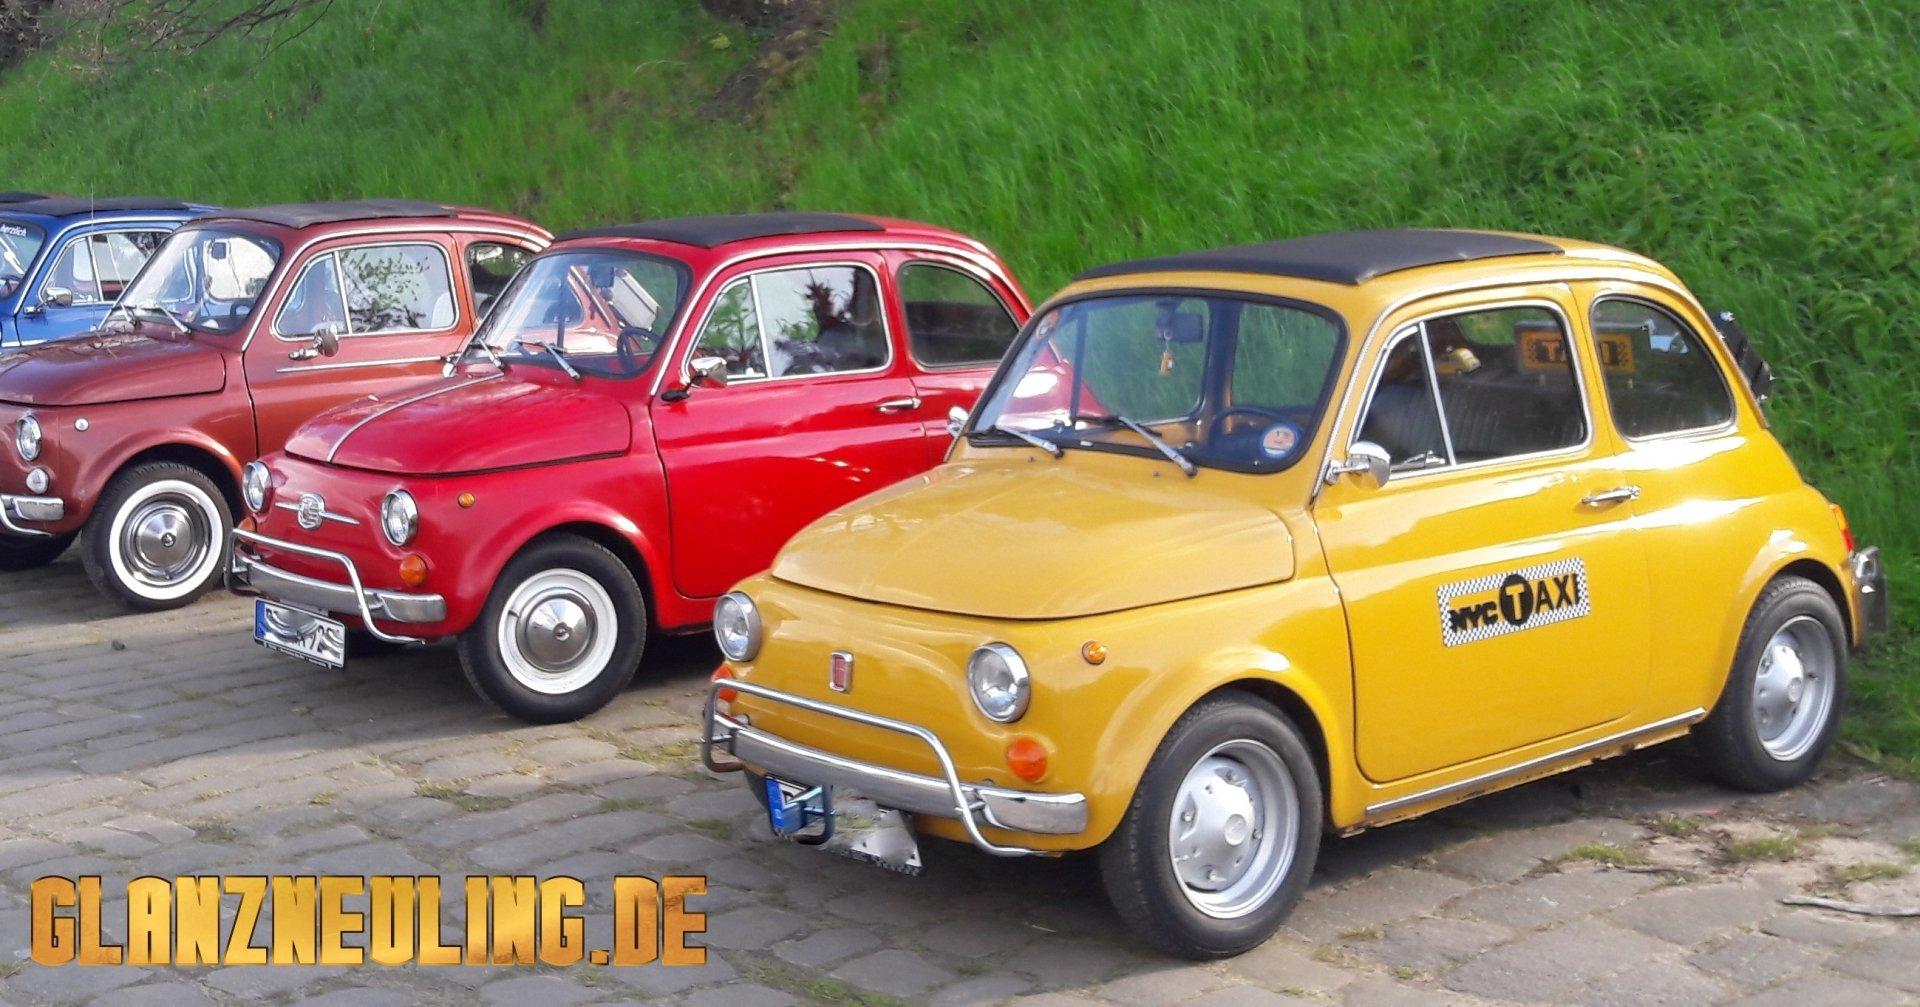 Filmautos mieten Sachsen, Dresden, Berlin, BRandenburg Görlitz bundesweit